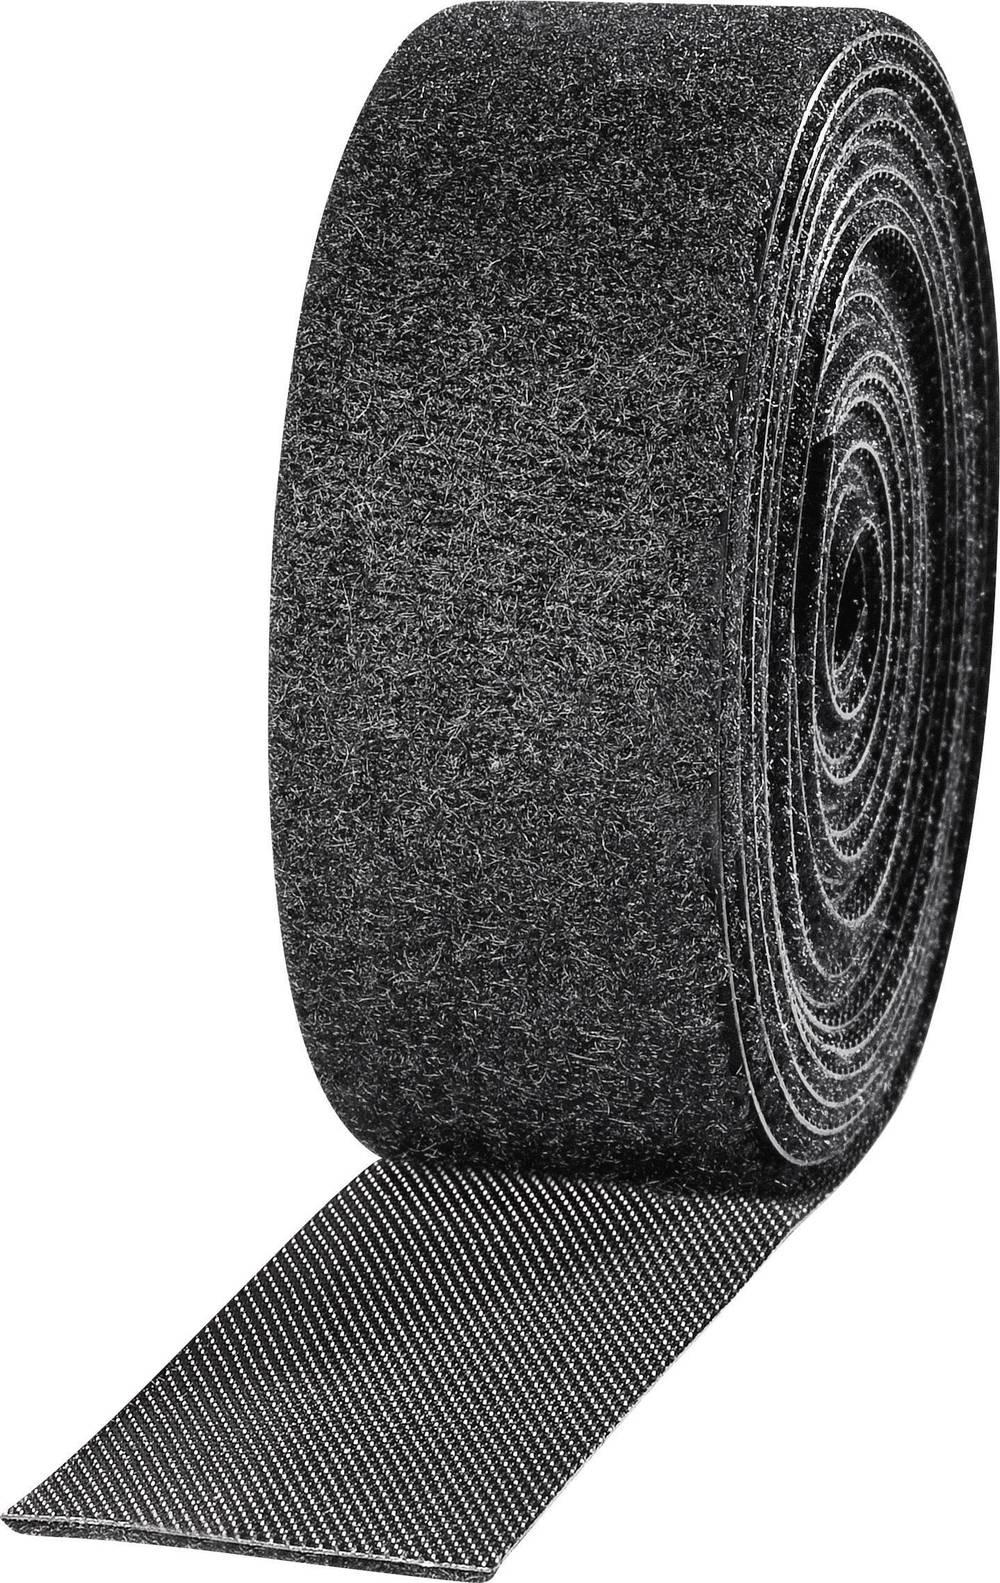 Traka s čičkom za vezanje ETN FAST-Strap Fastech prianjajući i mekani dio (D x Š) 2.5 m x 25 mm crna TOOLCRAFT KL25X2500C 2 kolu